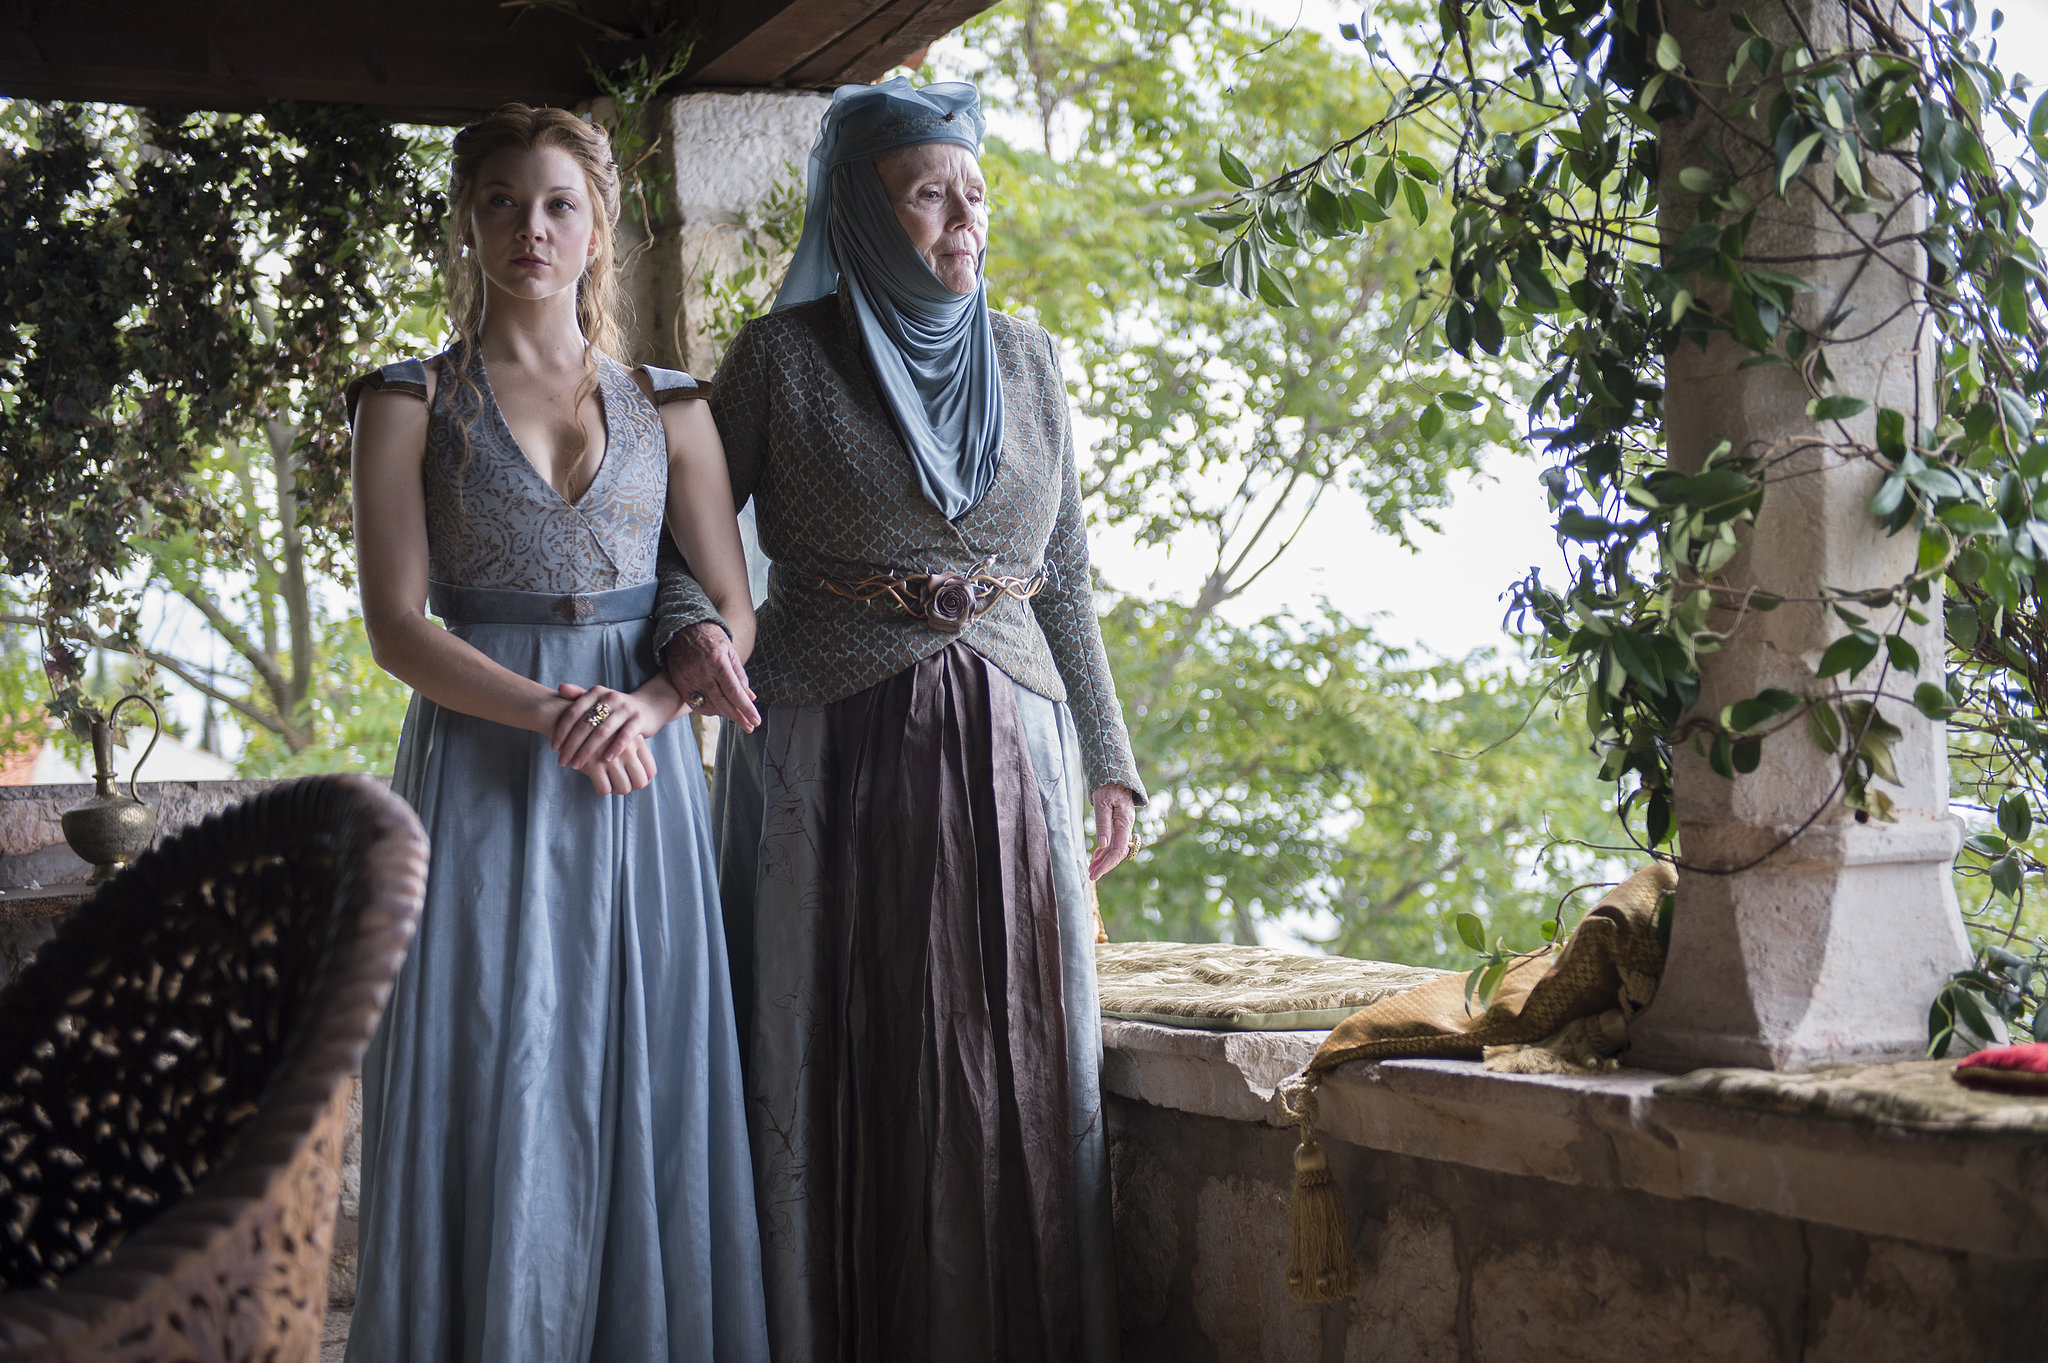 Joffrey and Margaery: Engaged and Enraged